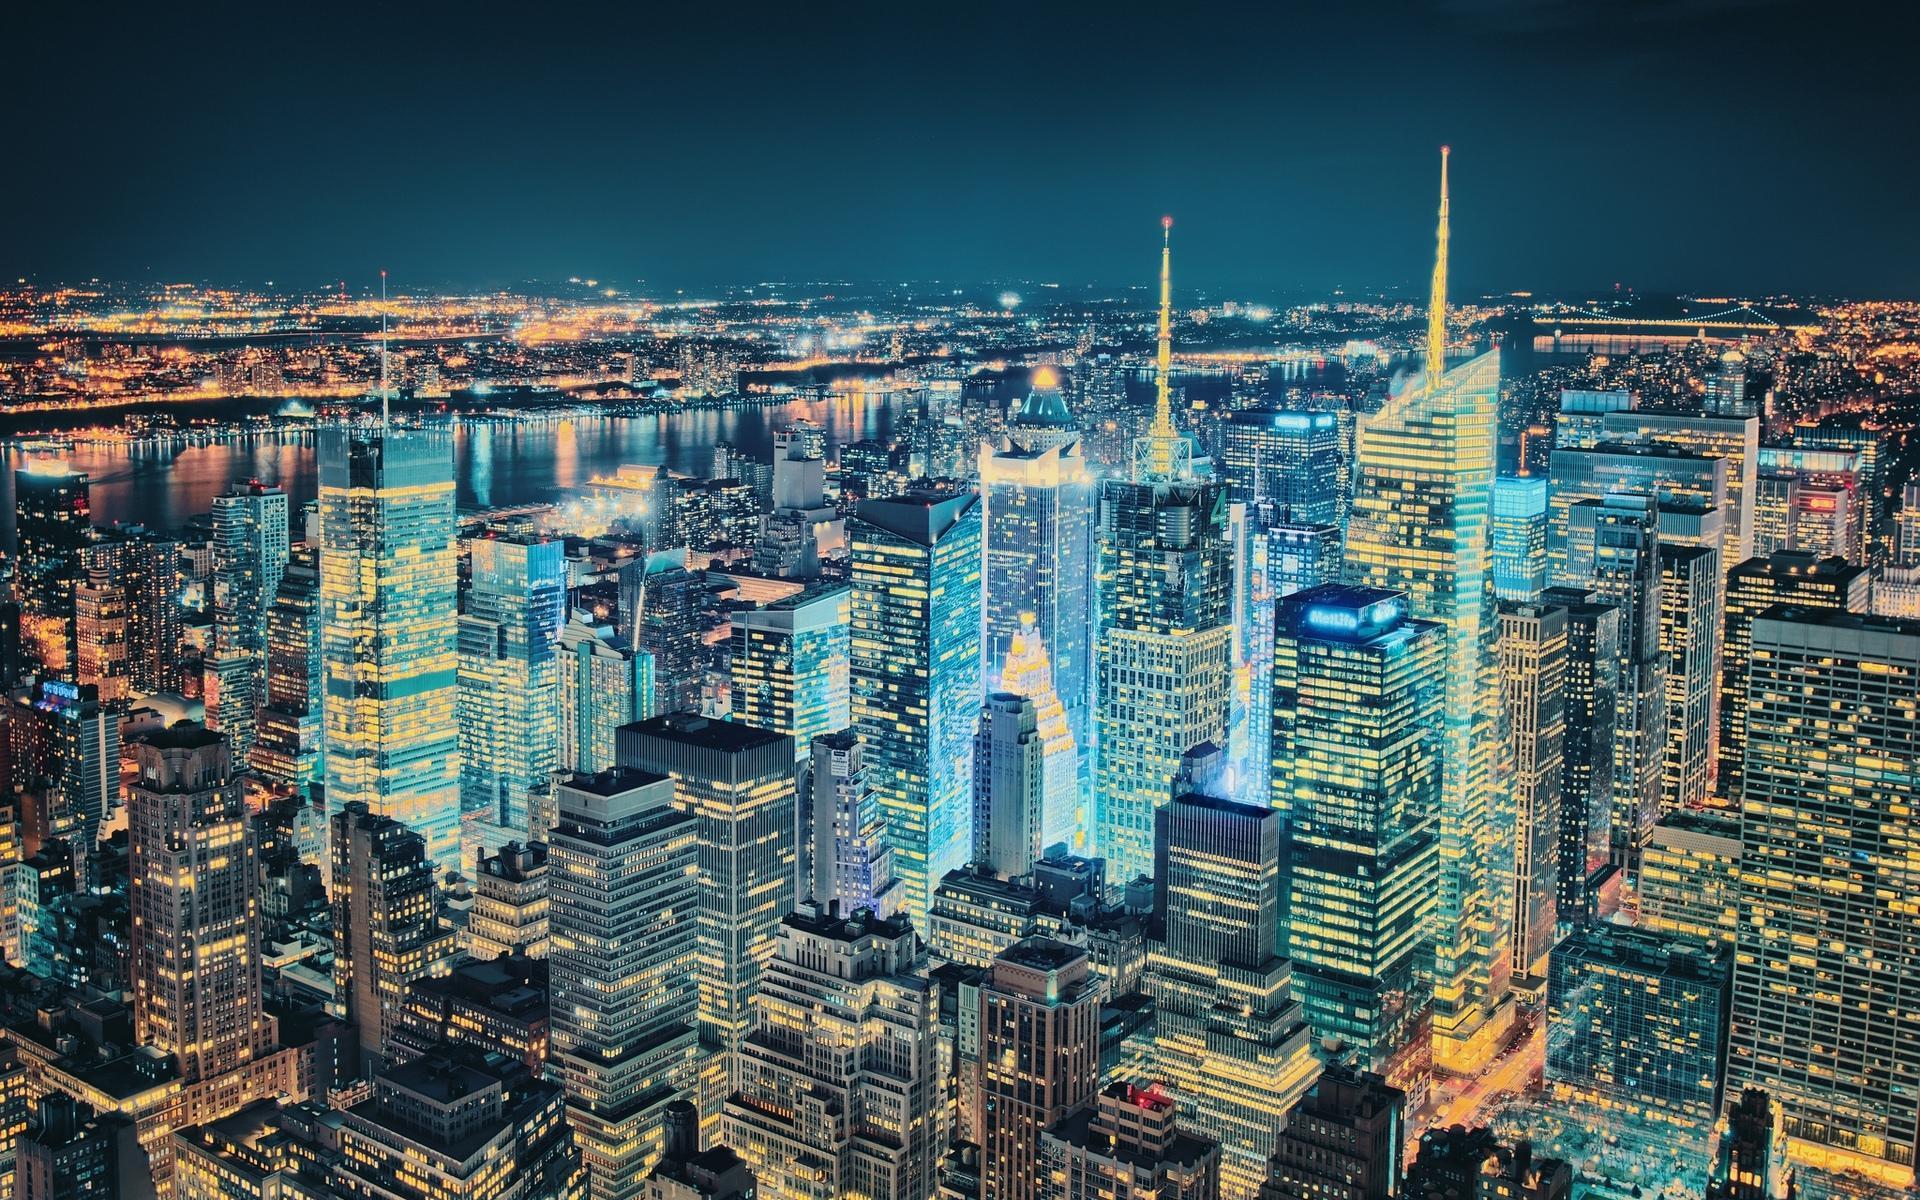 New York City 1080P Wallpaper Best Hd Wallpapers 1920x1200